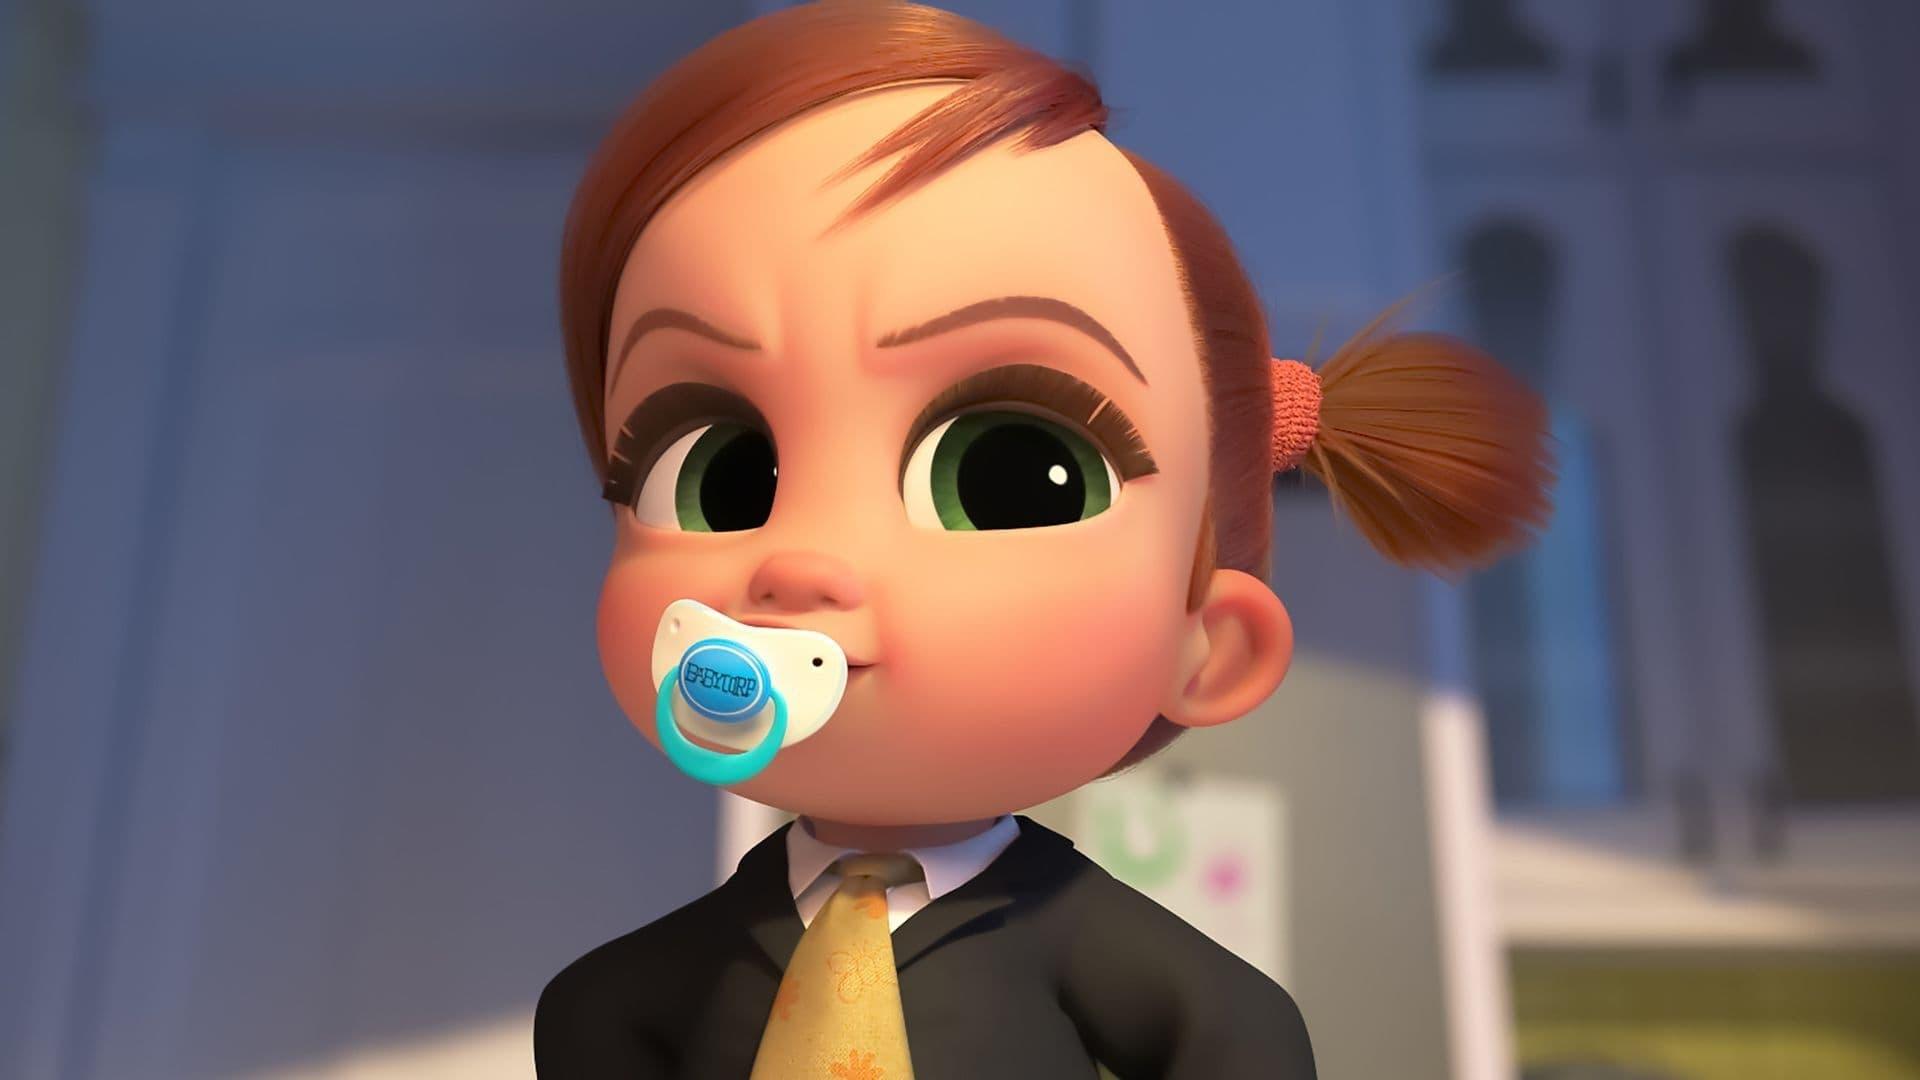 The Boss Baby: Perhebisnes (2021)